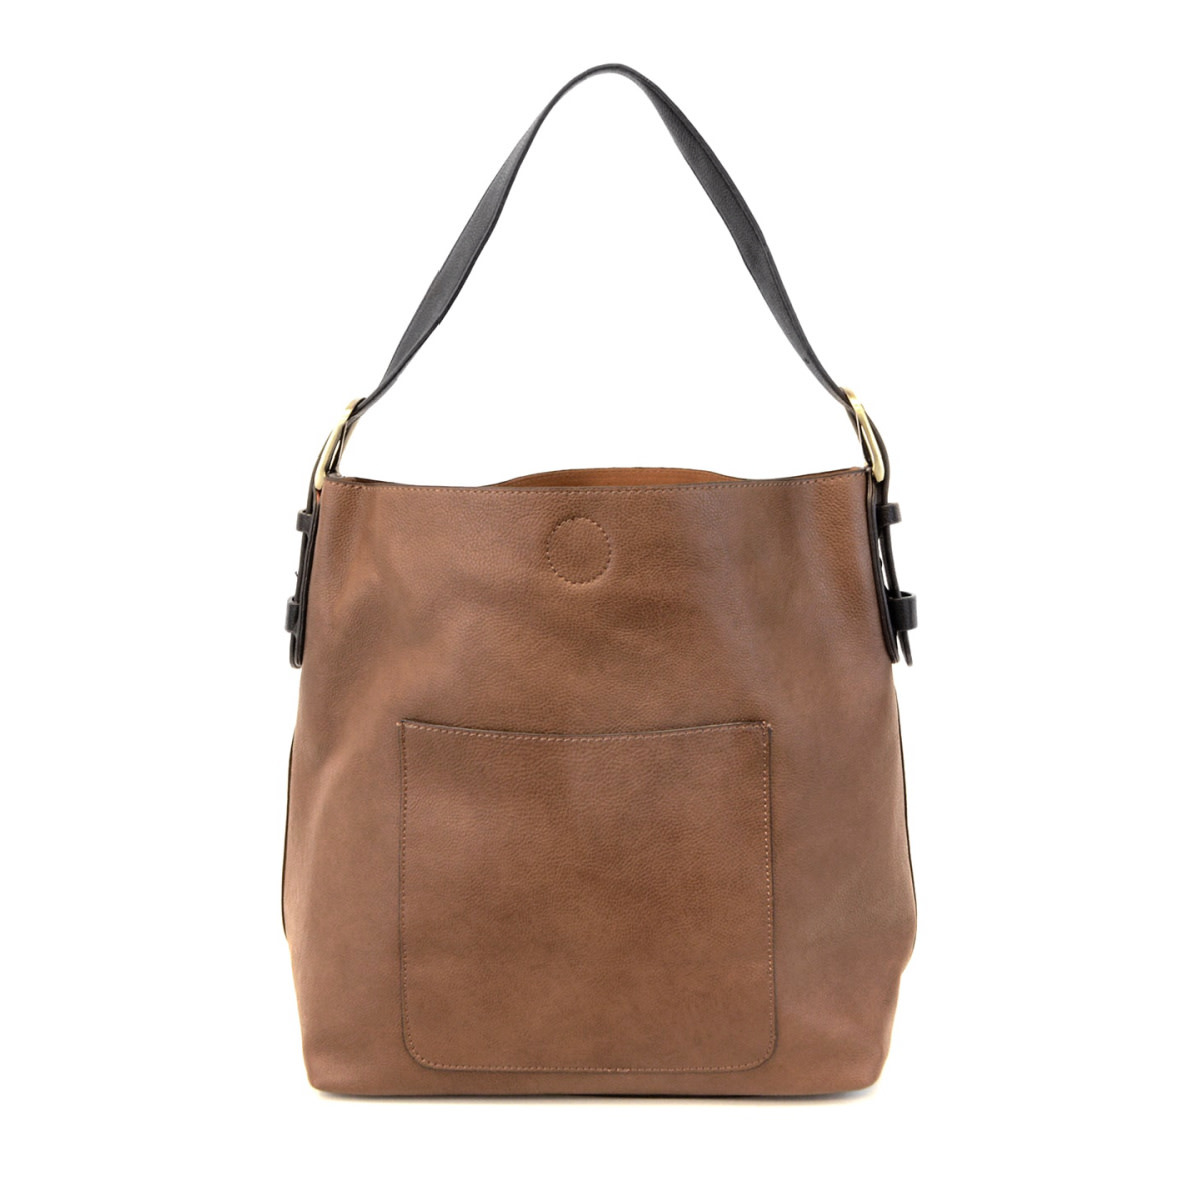 Joy Susan Joy Susan Classic Hobo Handbag Chestnut